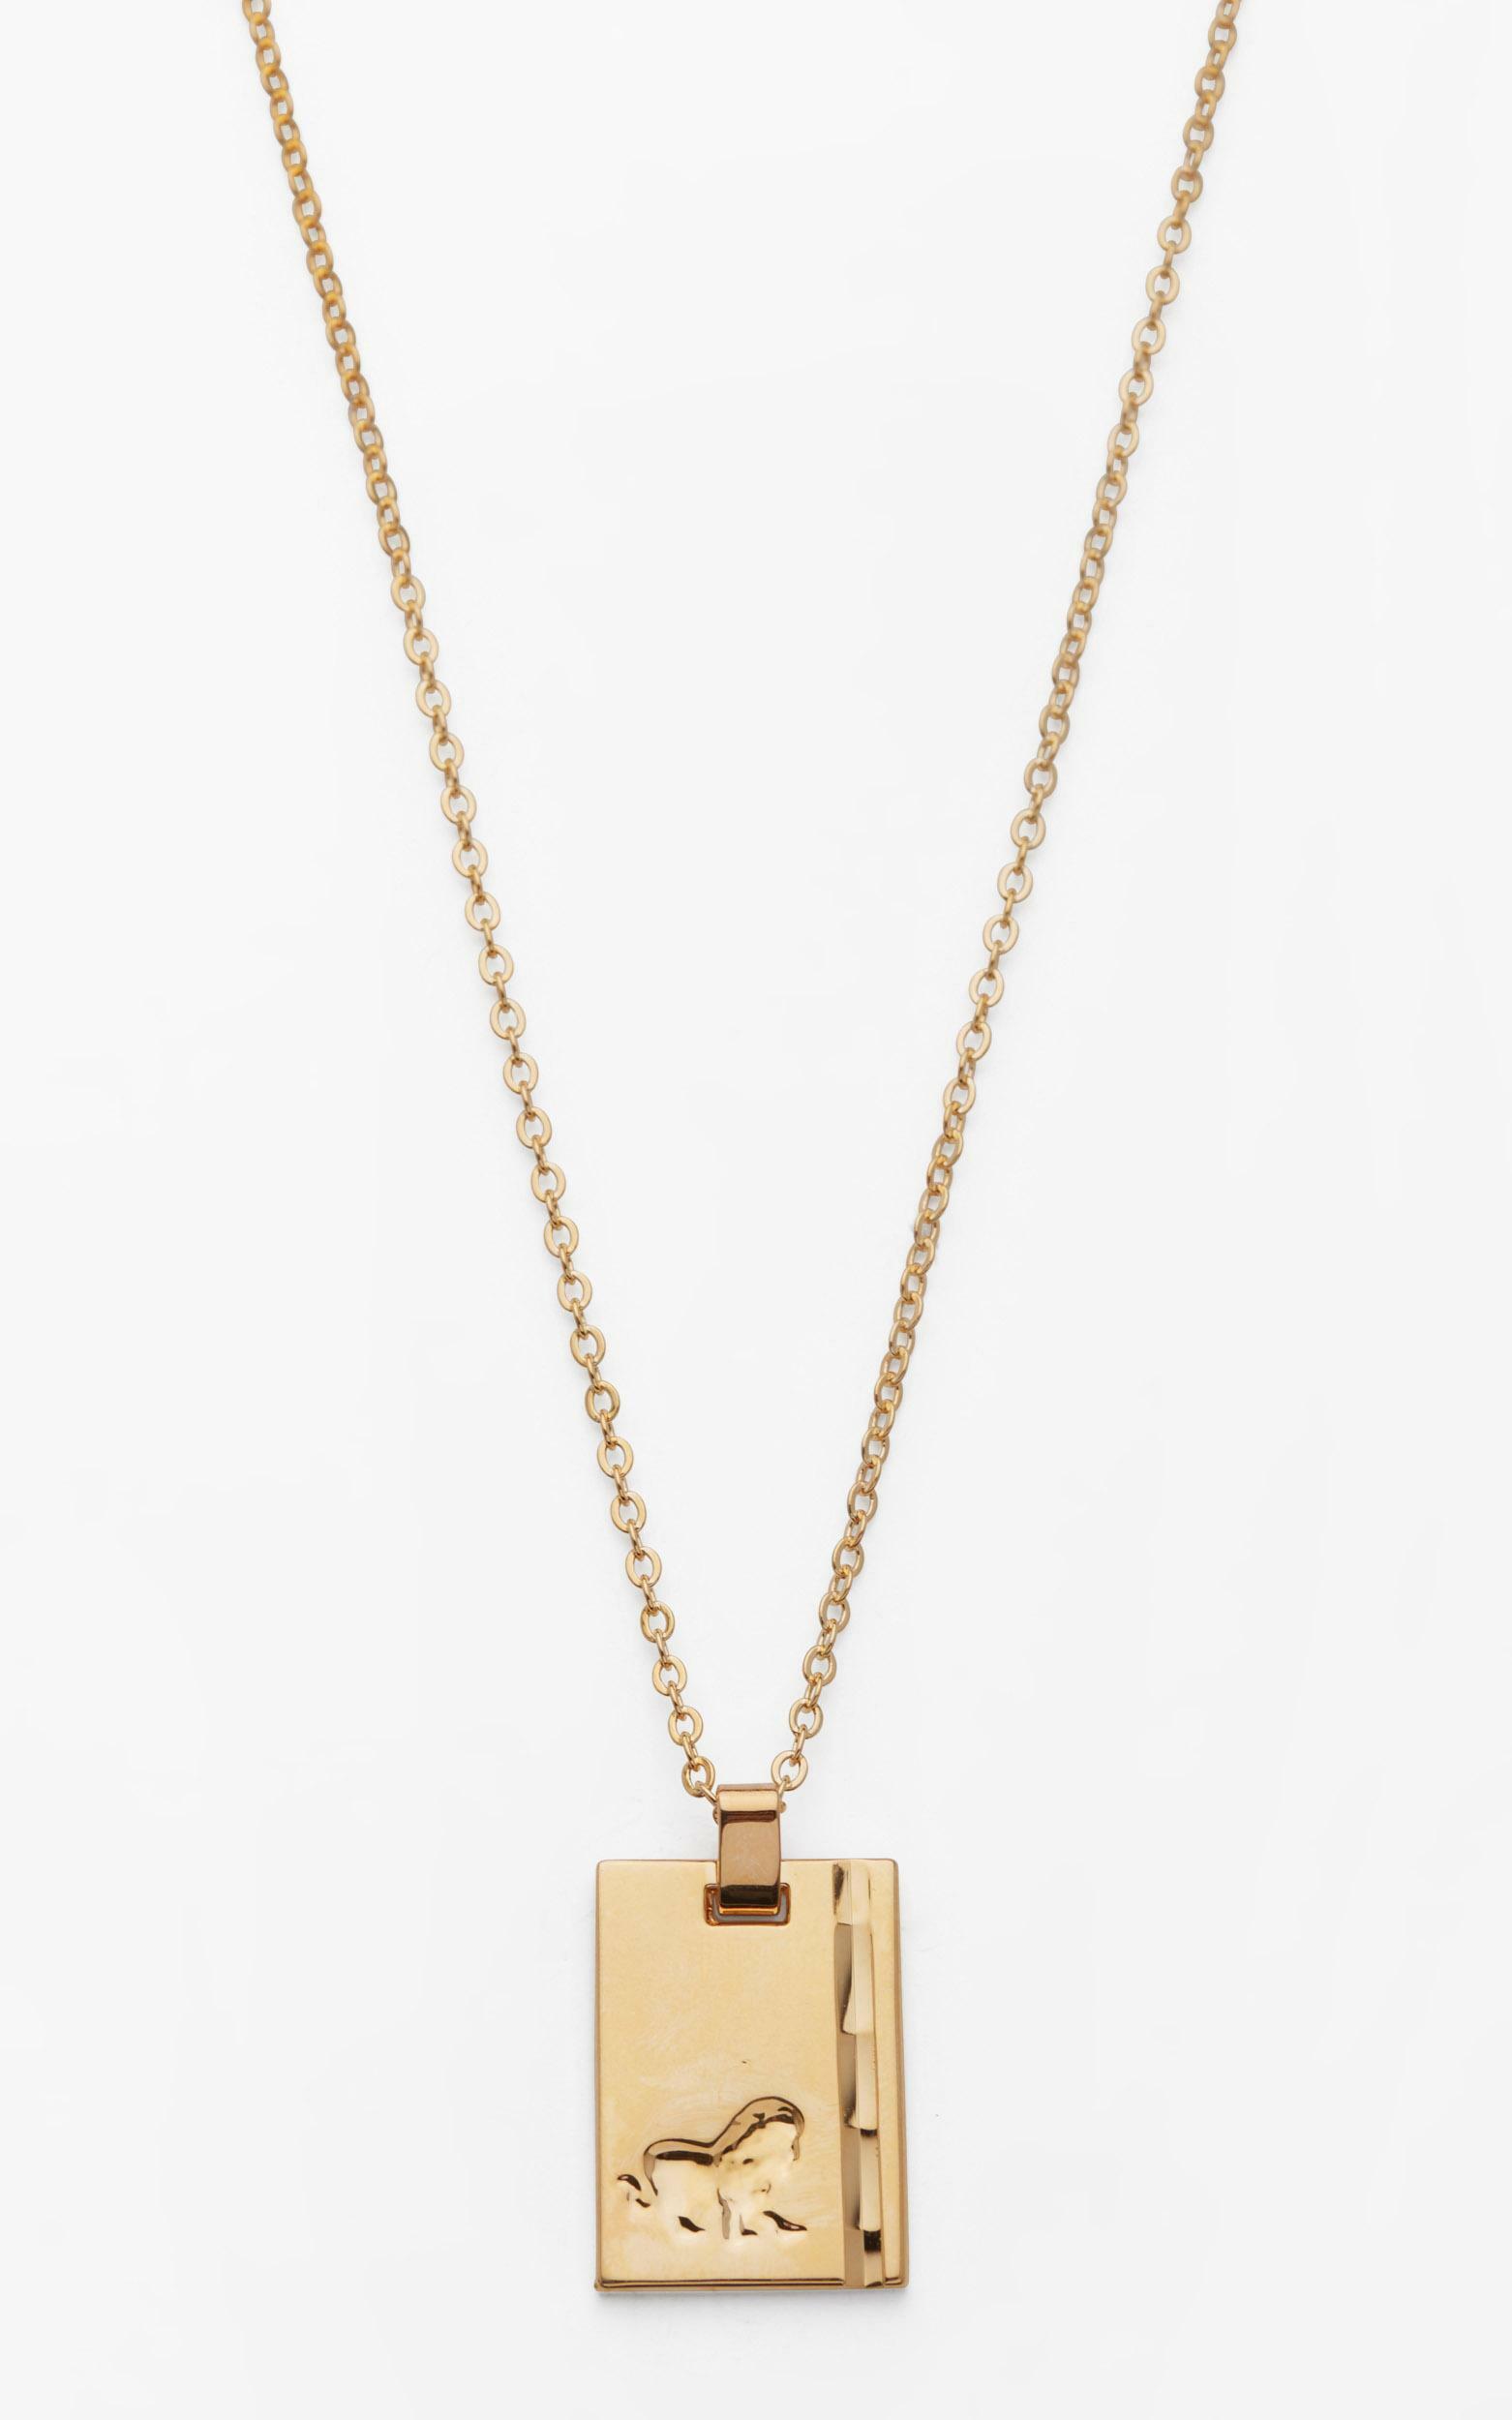 Reliquia - Leo Star Sign Pendant in Gold, GLD1, hi-res image number null